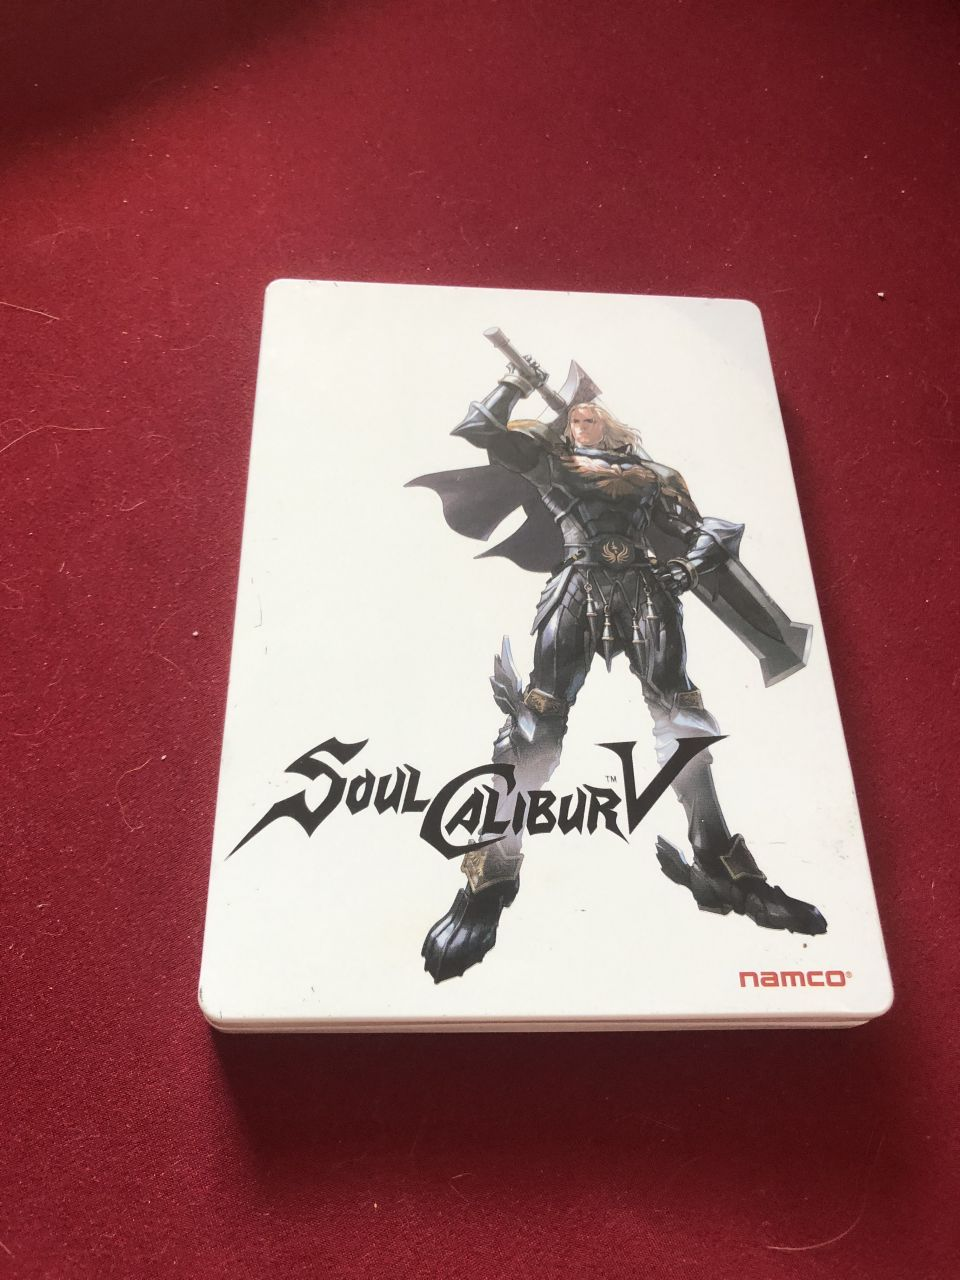 Image article Soul calibur V version Steelbook